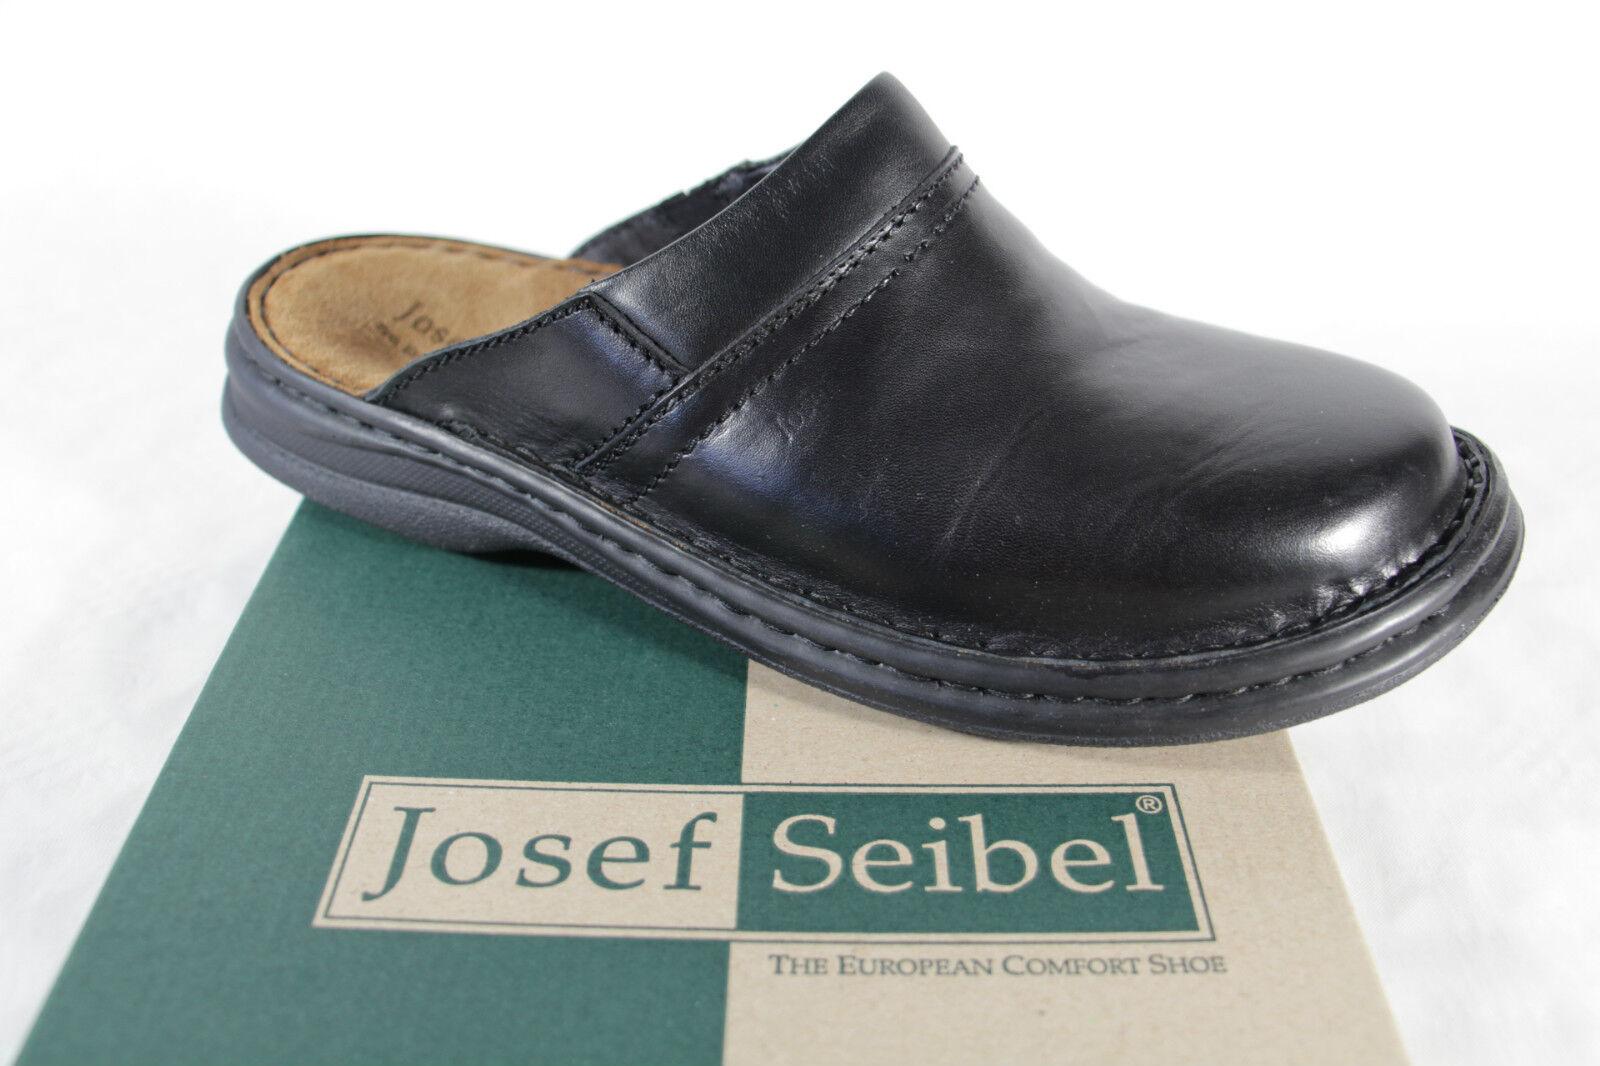 Seibel Clogs Sabot Mules nero Real  Leather 106663 Nuovo  migliore marca